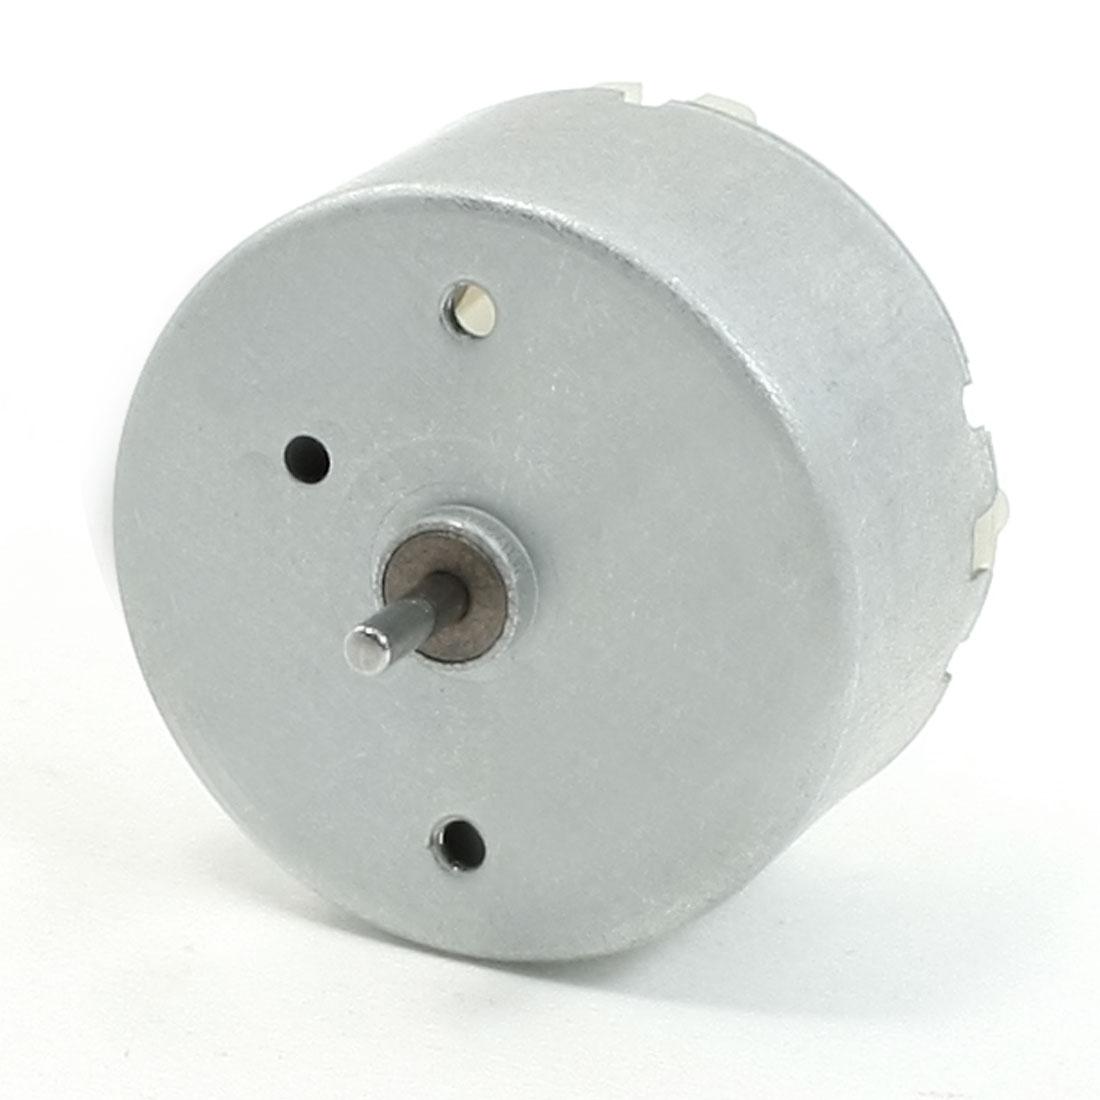 5300RPM Speed 12V High Torque Cylinder Shape Magnetic DC Geared Motor